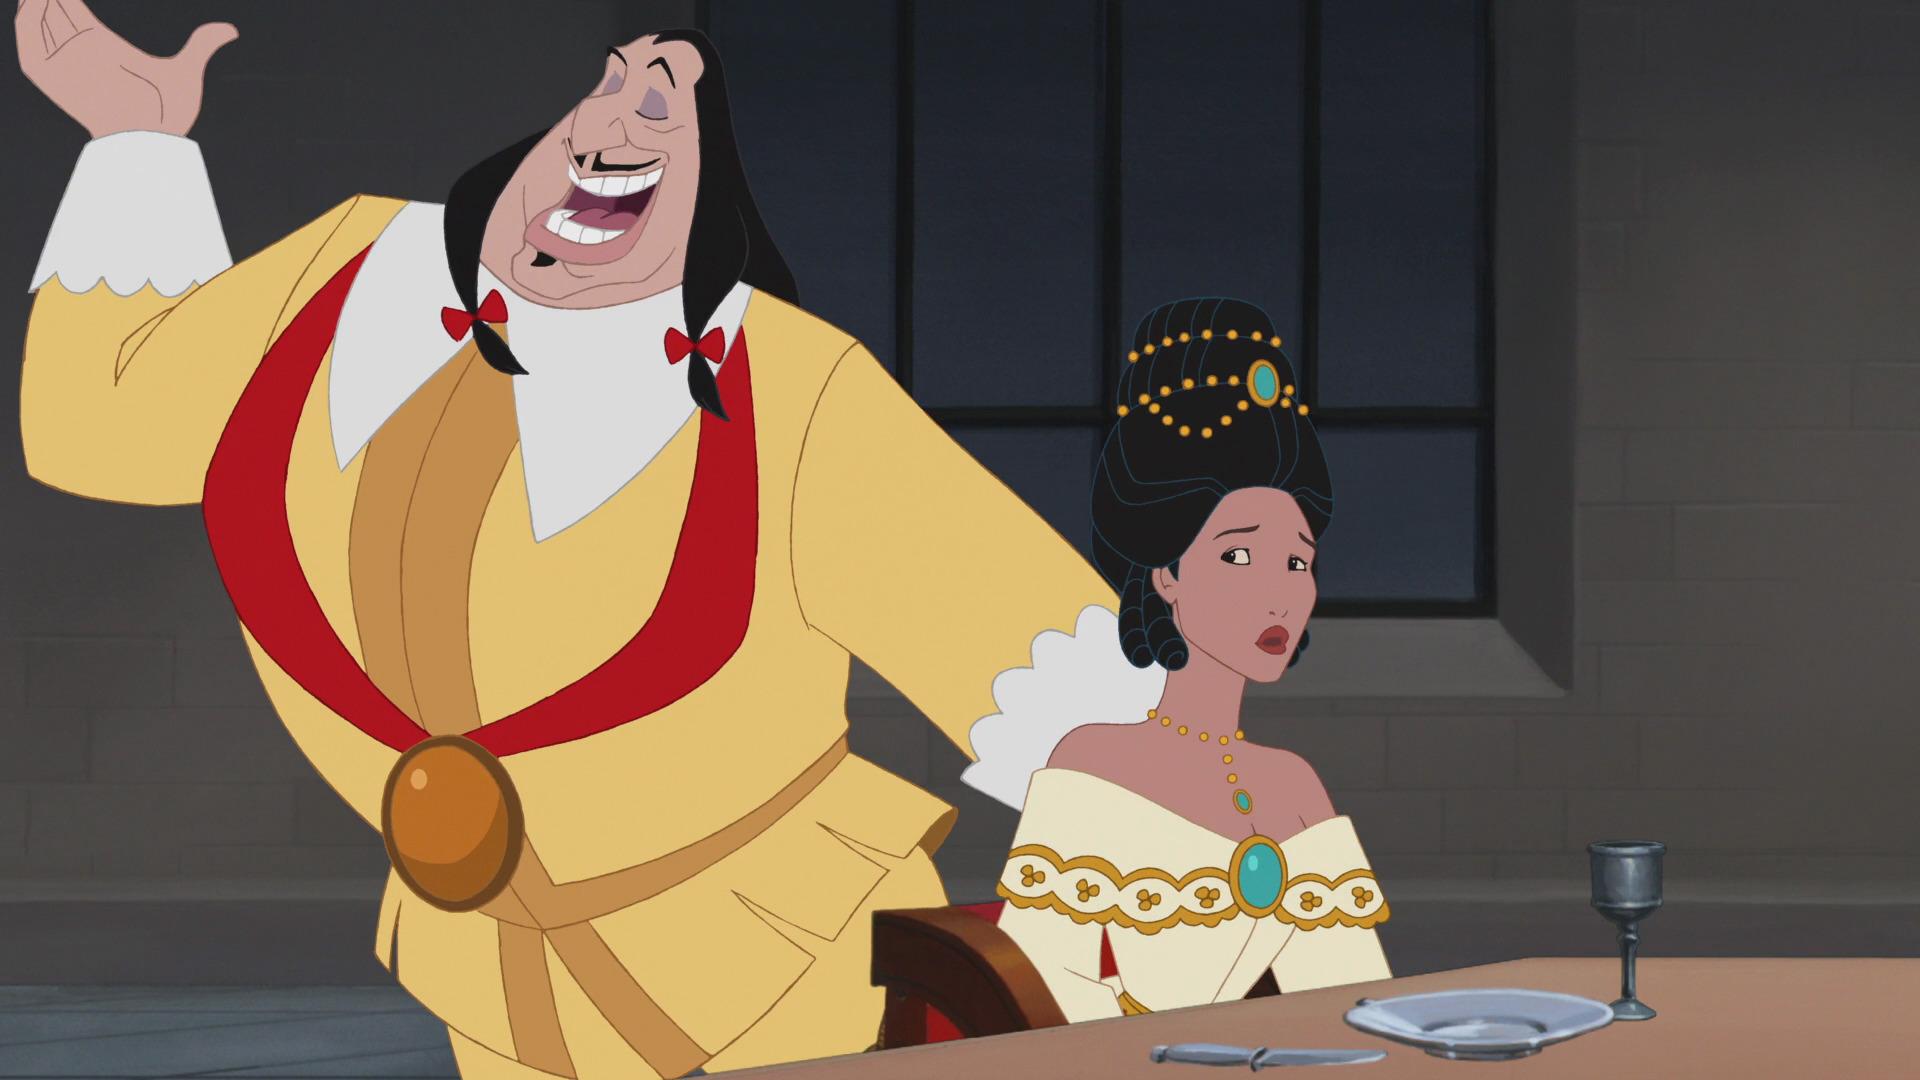 File:Ratcliffe and Pocahontas.jpg